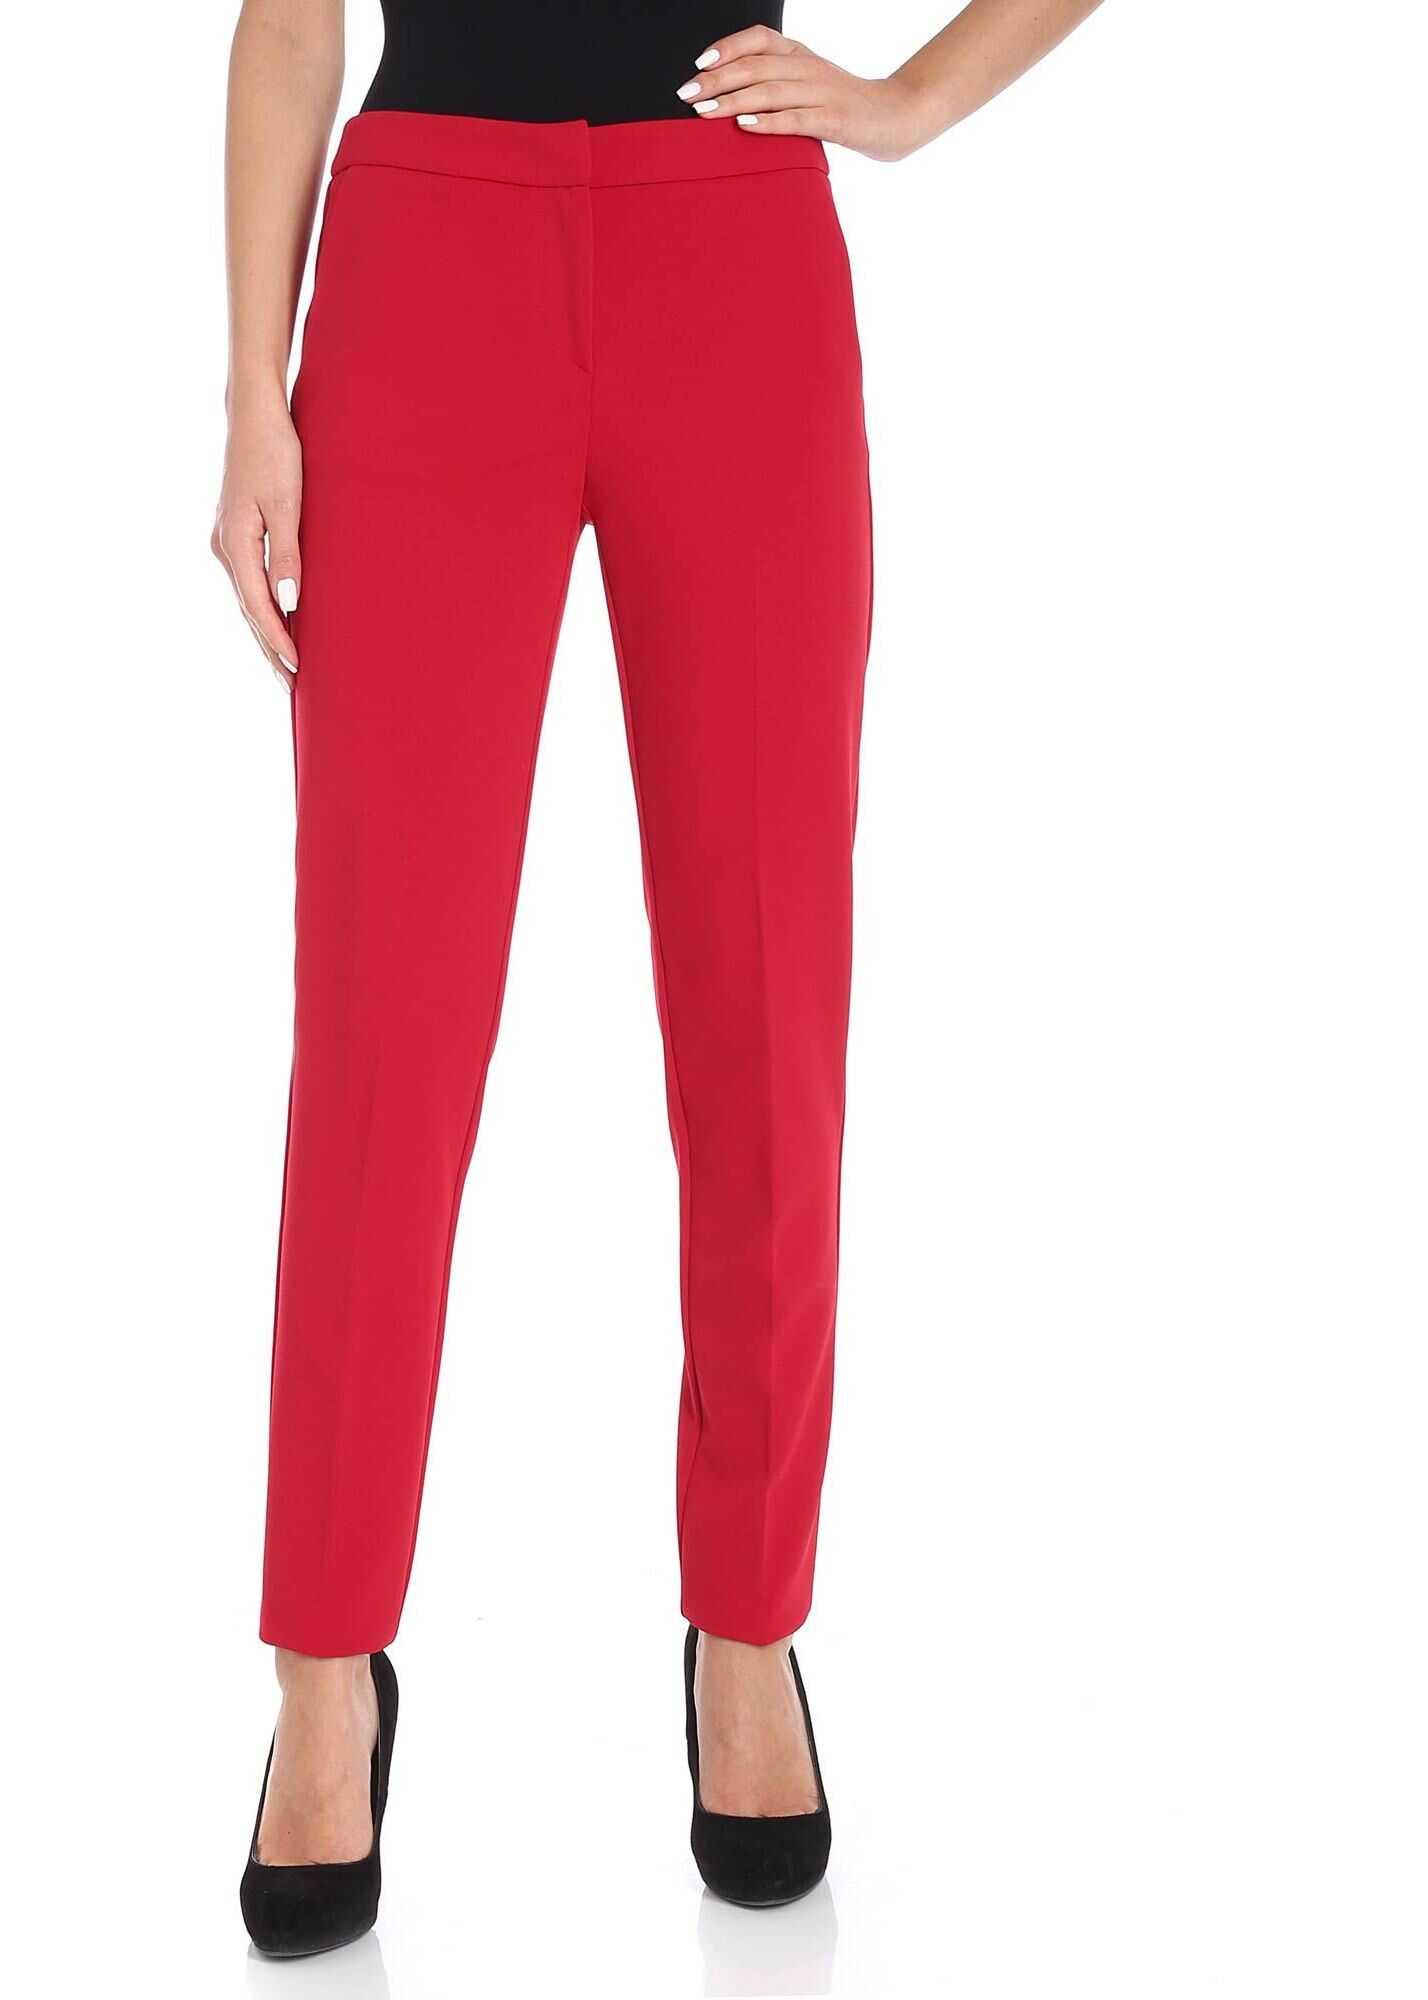 Blugirl Red Cigarette Trousers Red